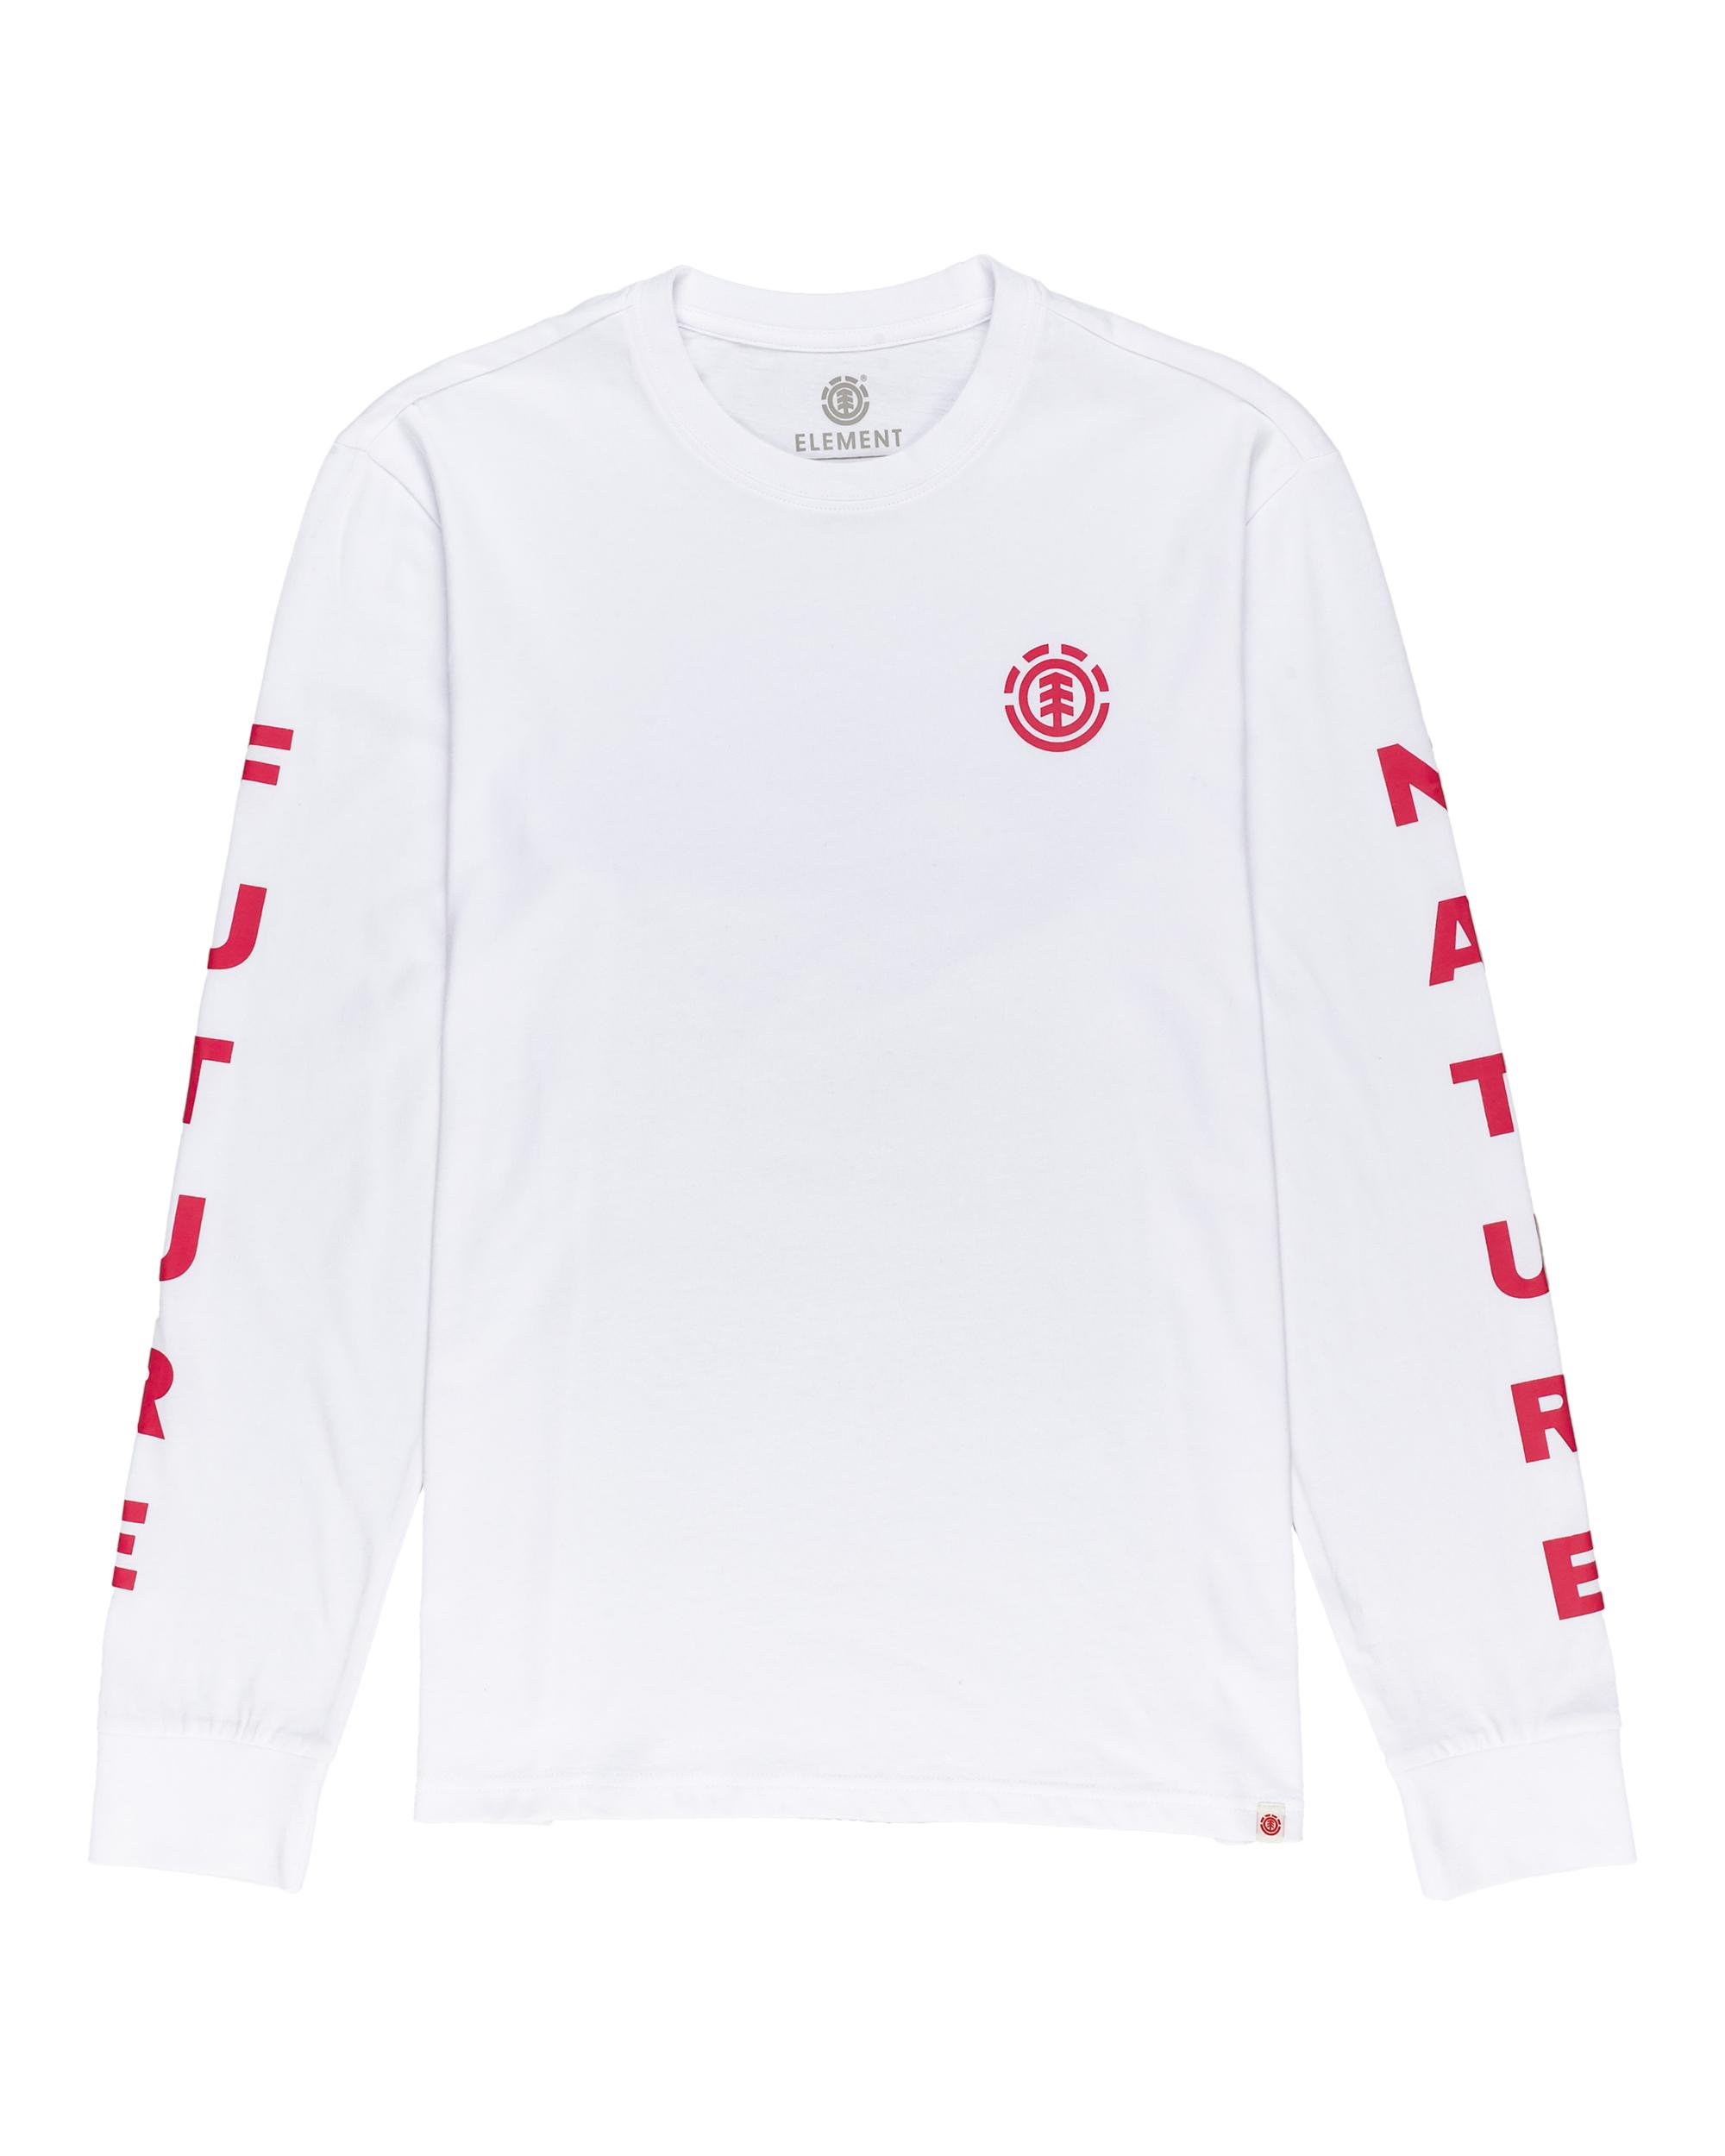 Element Argos LS t-shirt